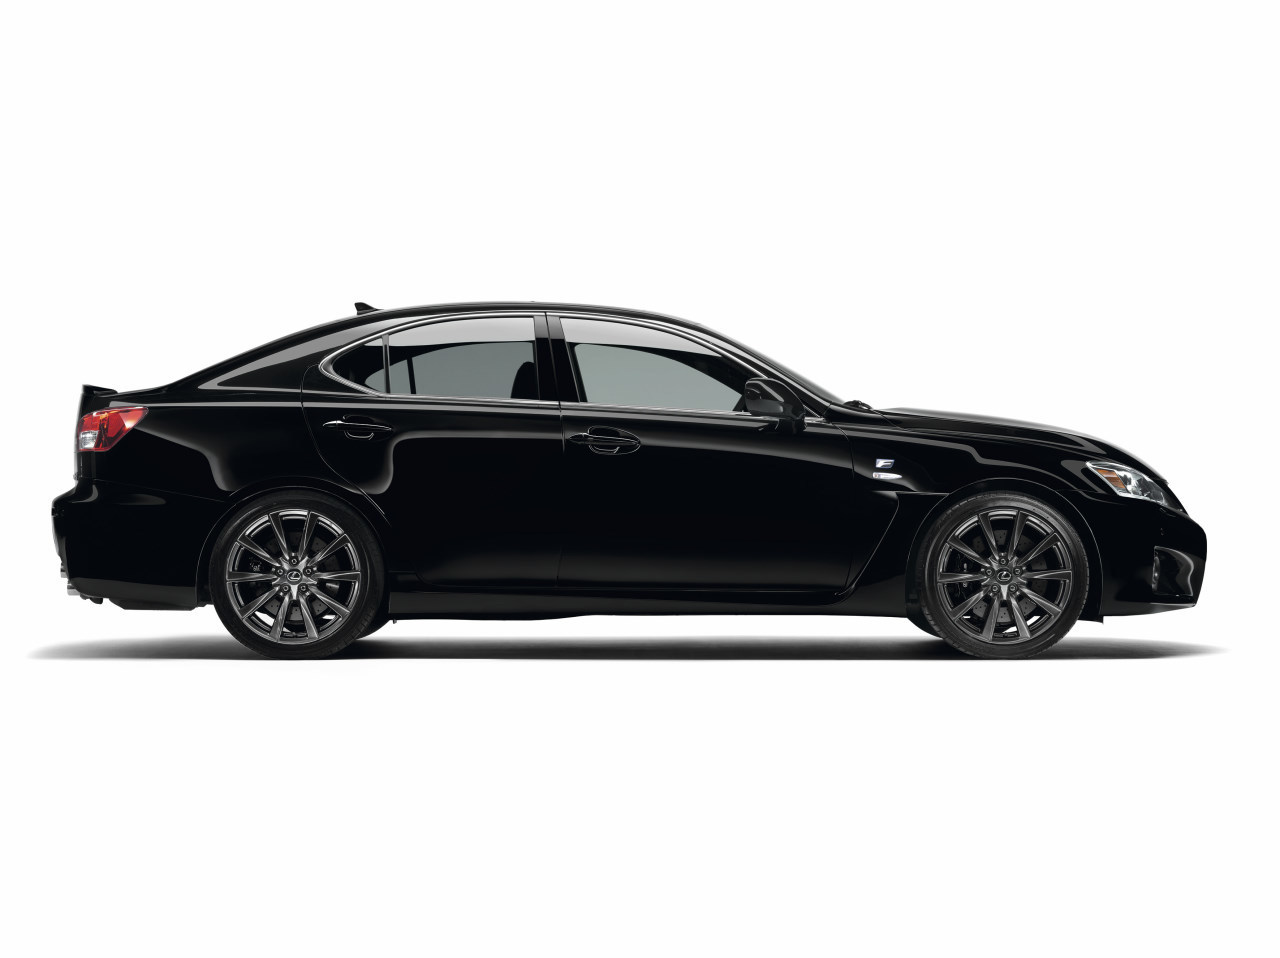 Foto de Lexus IS-F 2011 (11/13)